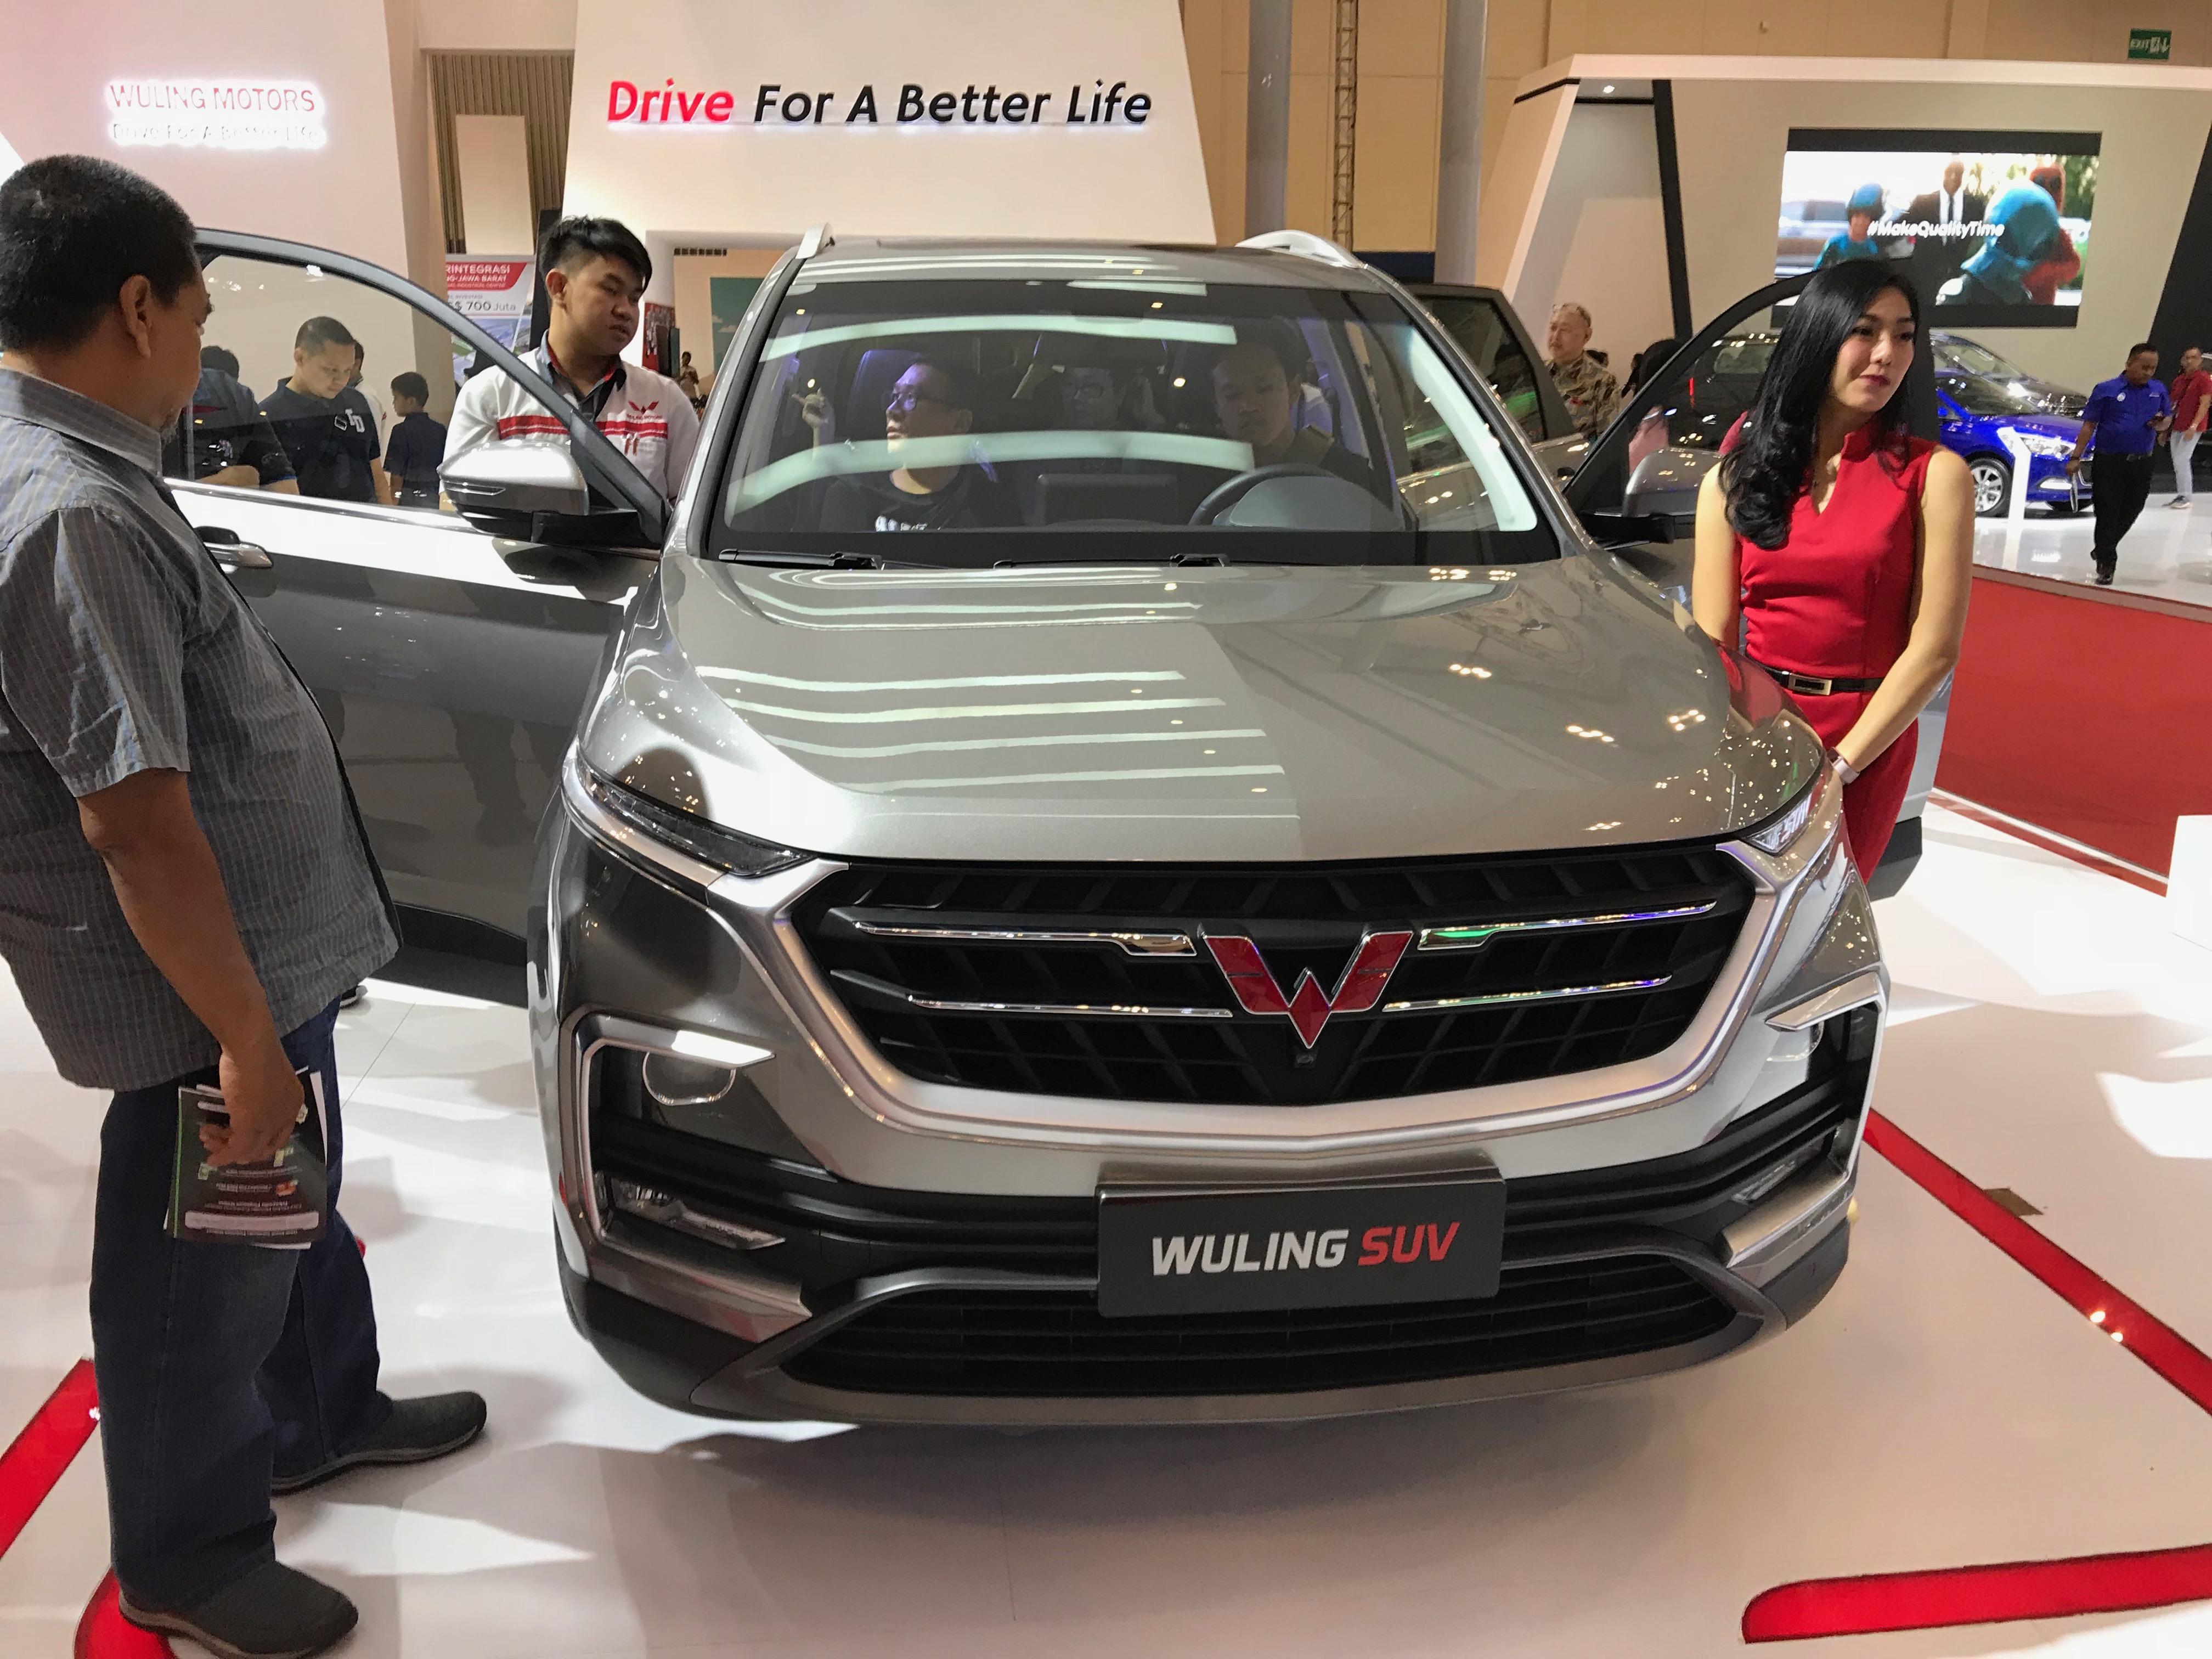 2018 - [Baojun/Wuling/Chevrolet/MG] 530/Almaz/Captiva/Hector Wuling_SUV_%28Baojun_530%29